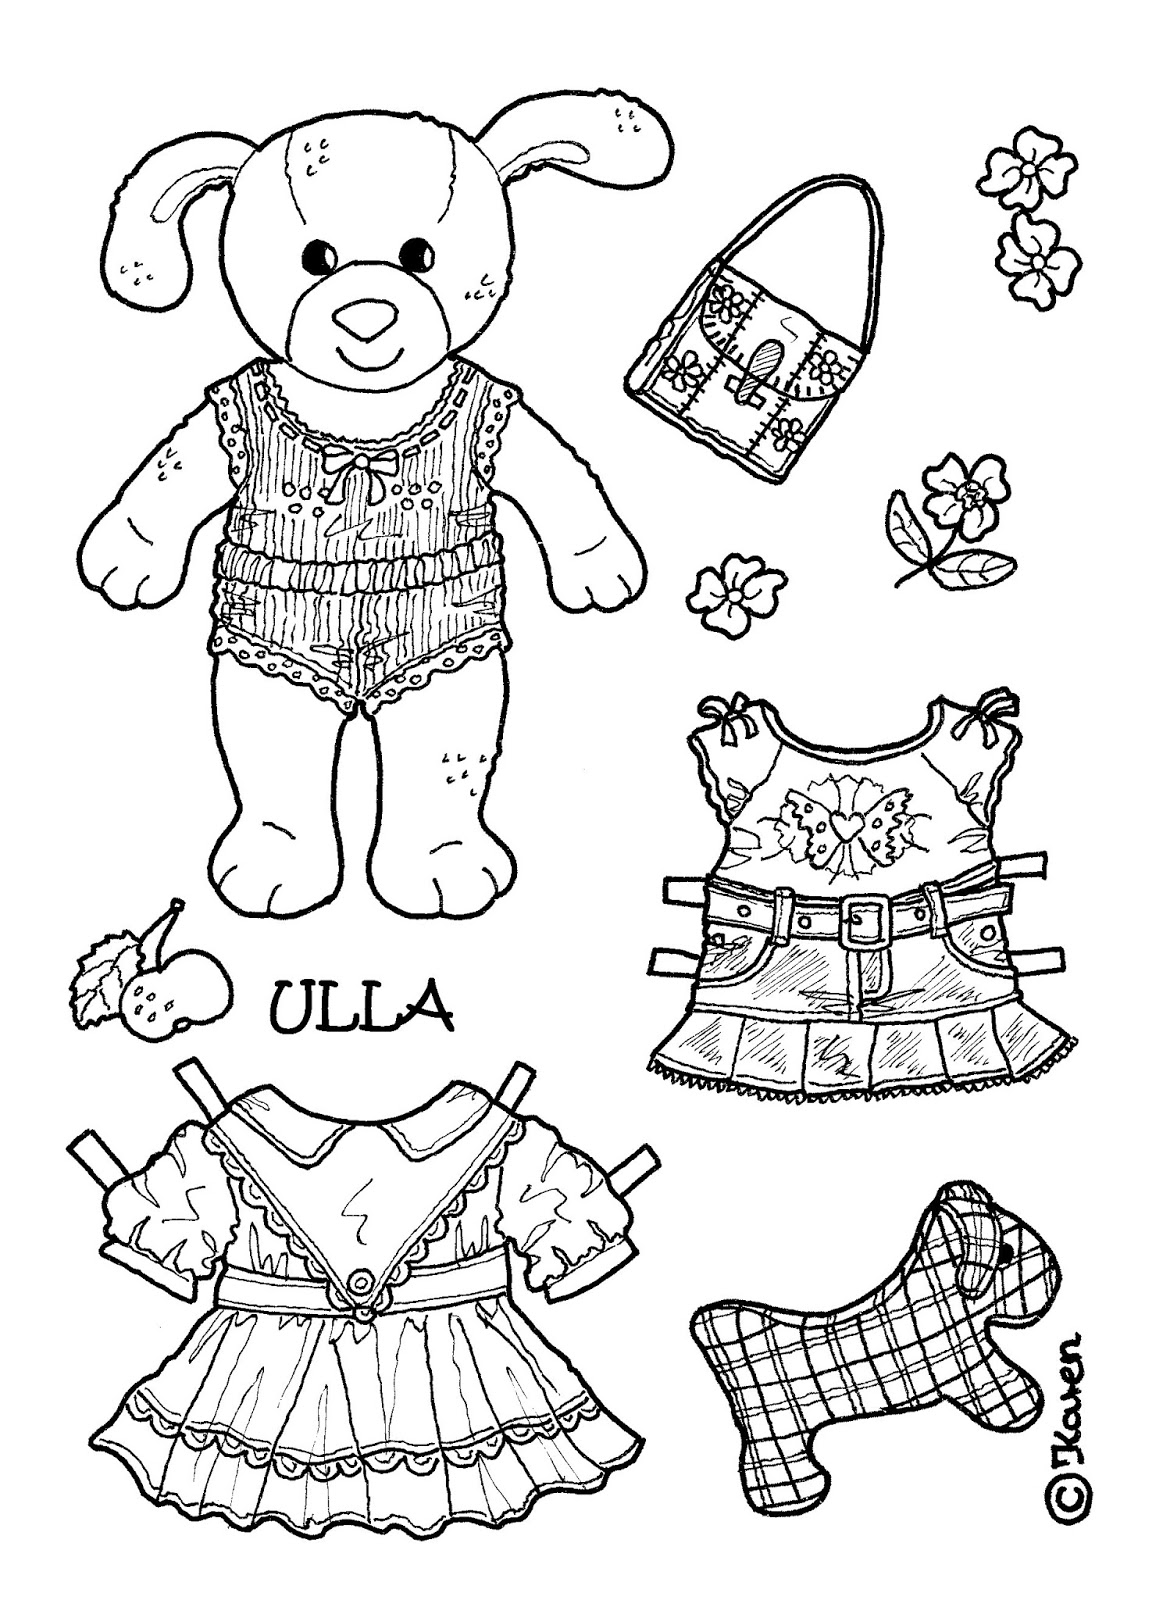 Karen`s Paper Dolls: Ulla 1-4 Paper Doll in Big Size to